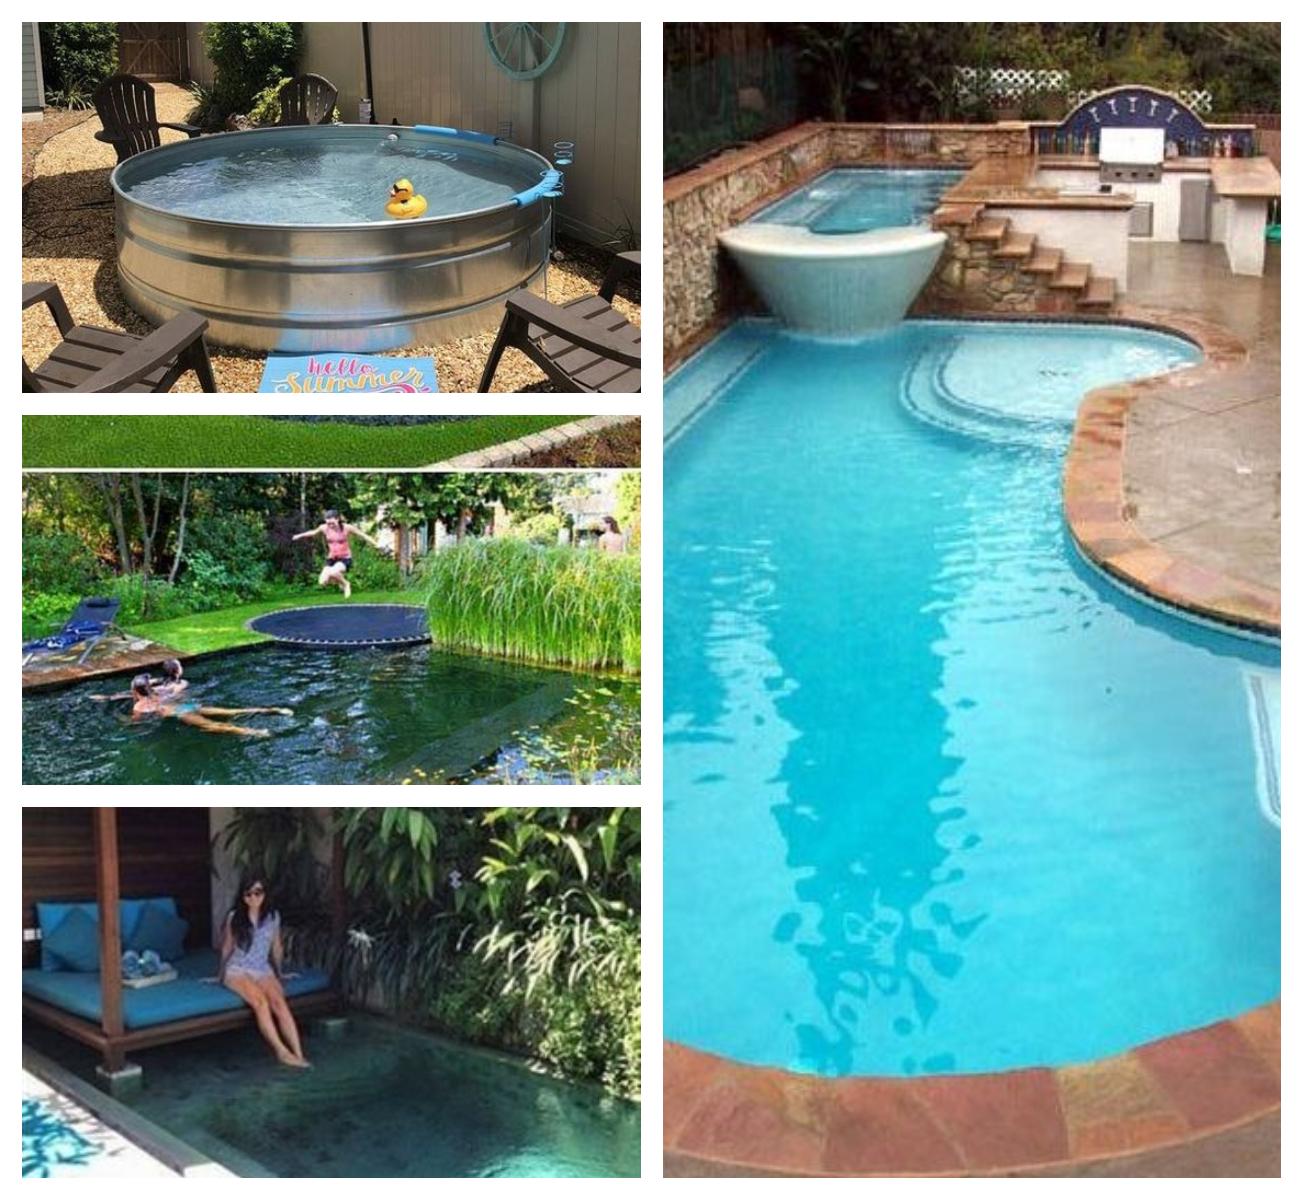 14 Kreative Diy Garten Pool Ideen :)